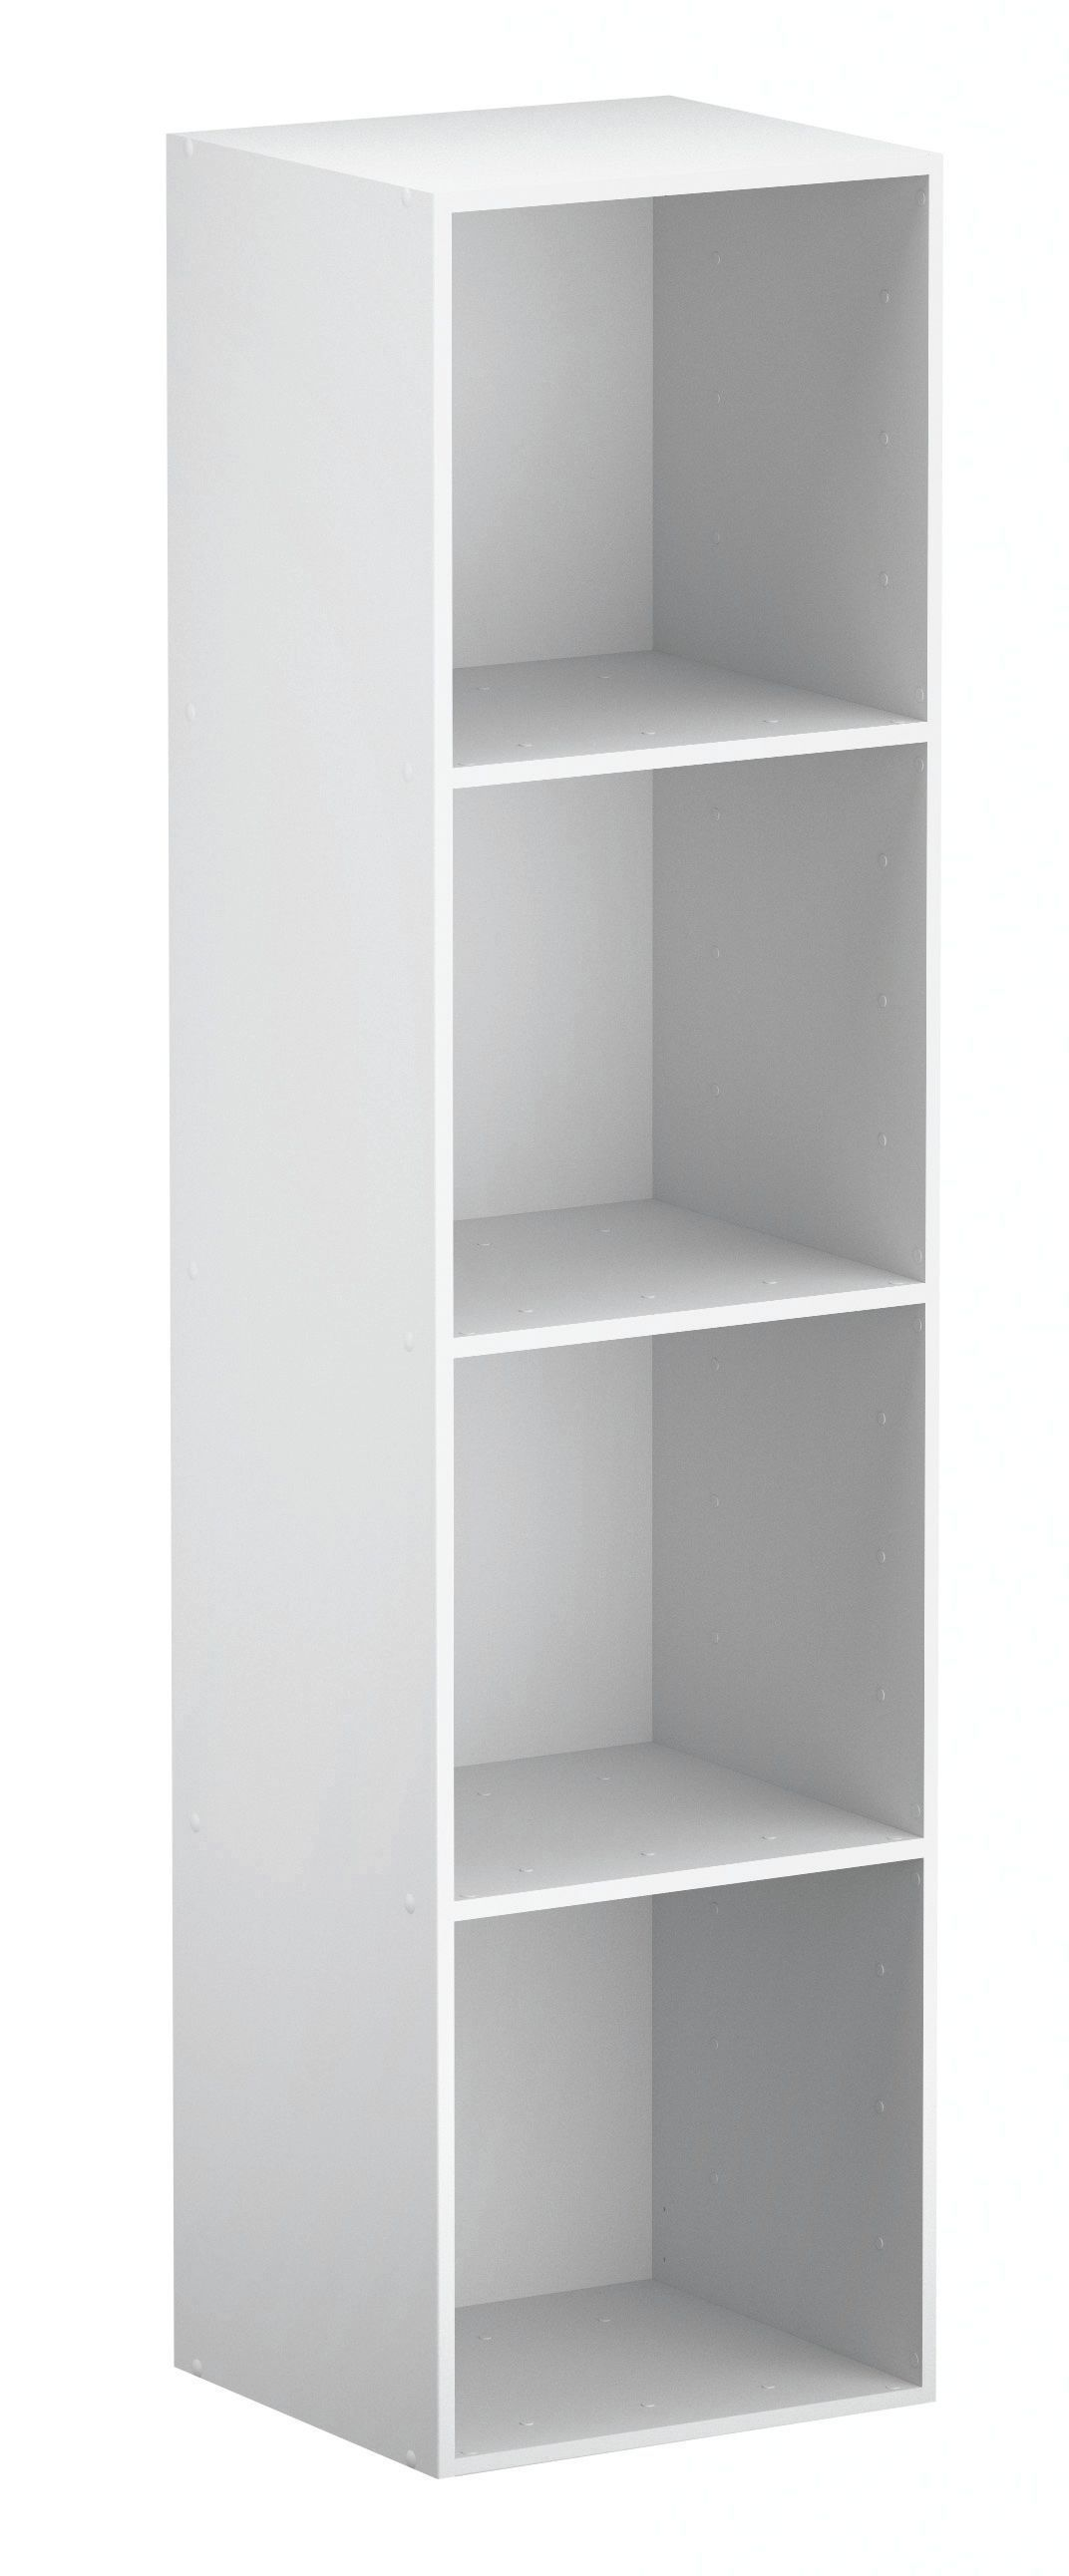 Form Konnect White 4 Cube Shelving Unit H 1372mm W 352mm Departments Diy At B Q Cube Shelving Unit Shelving Unit Room Diy